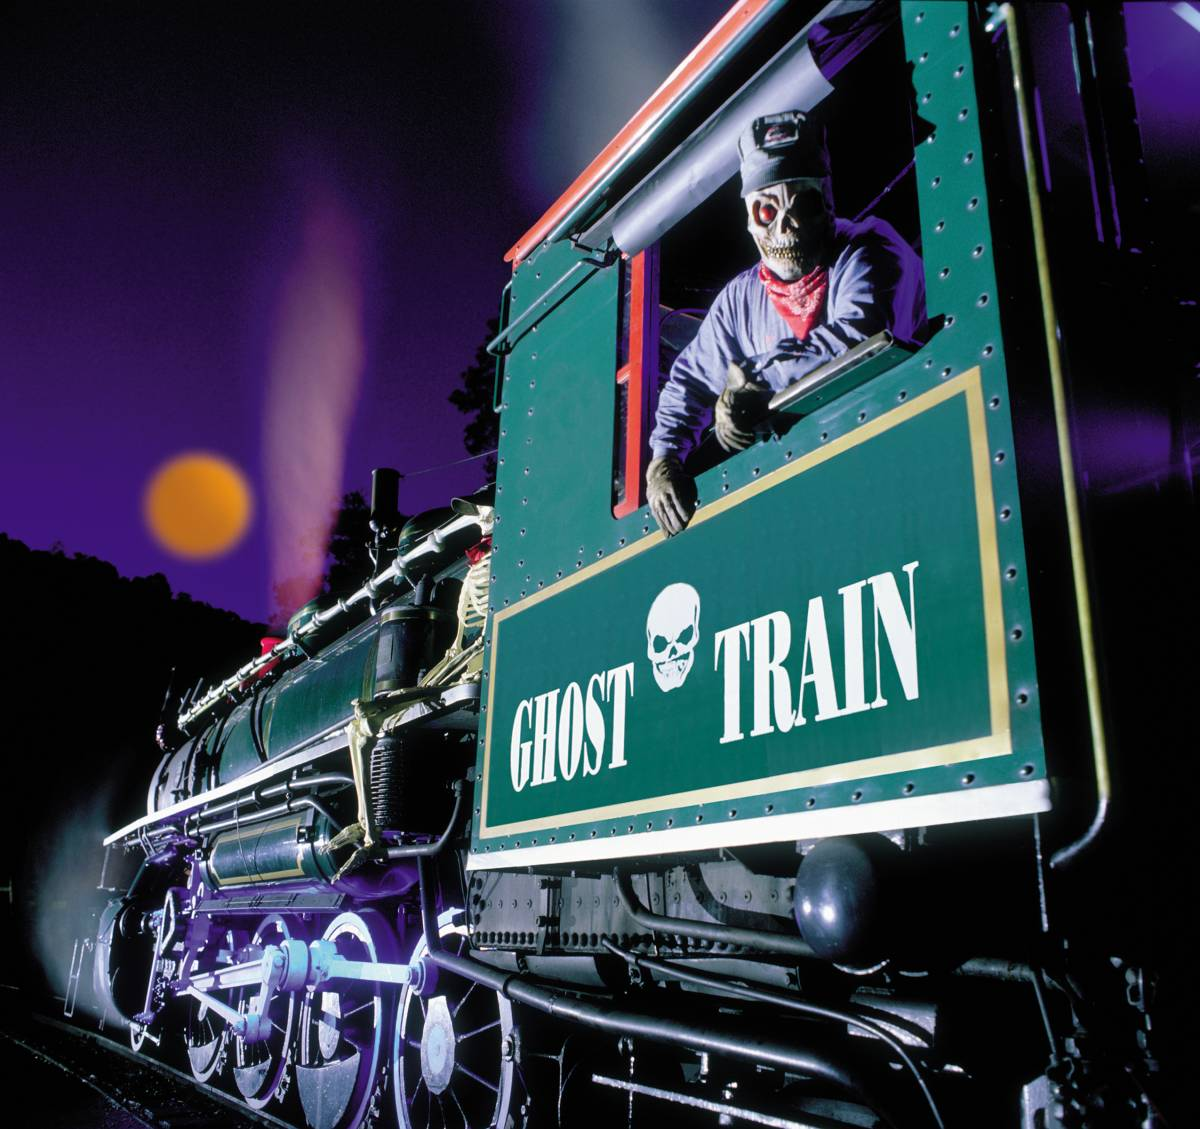 tweetsie_ghost_train_8_1200_1129_70_int_s_c1.jpg